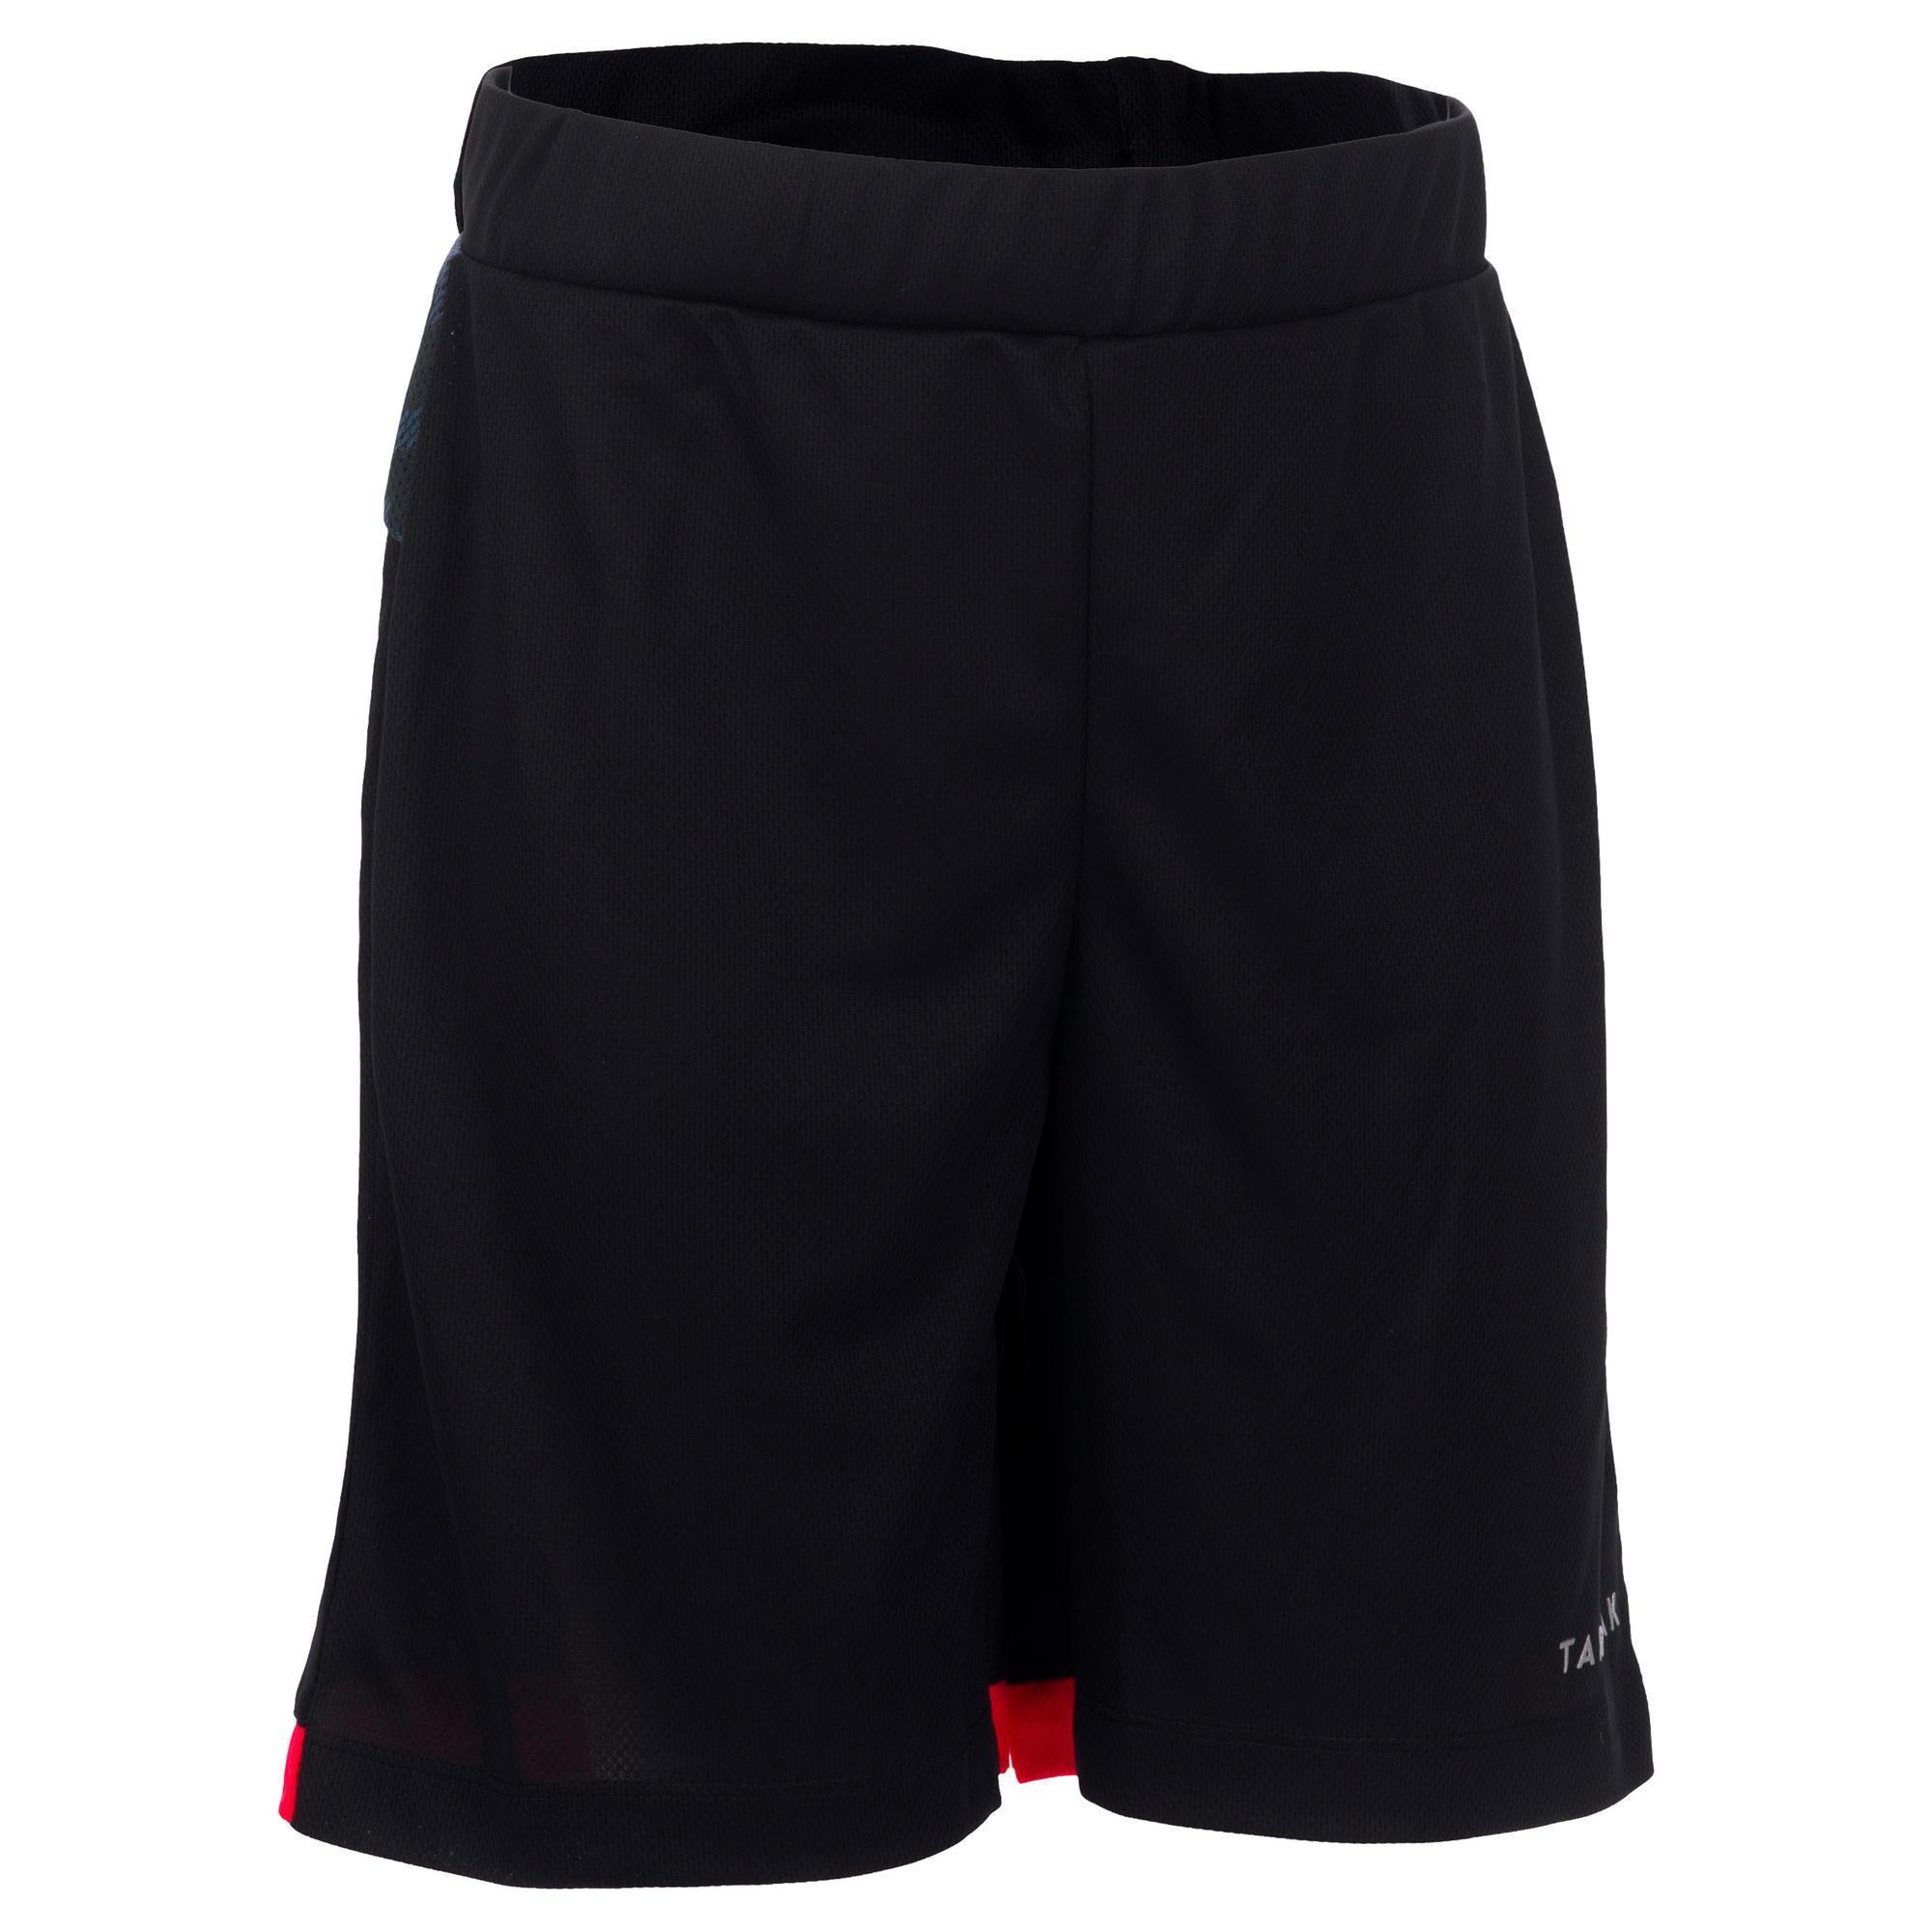 Basketballshorts B500 Jungen/Mädchen Fortgeschrittene schwarz/grau   Sportbekleidung > Sporthosen > Basketballshorts   Tarmak